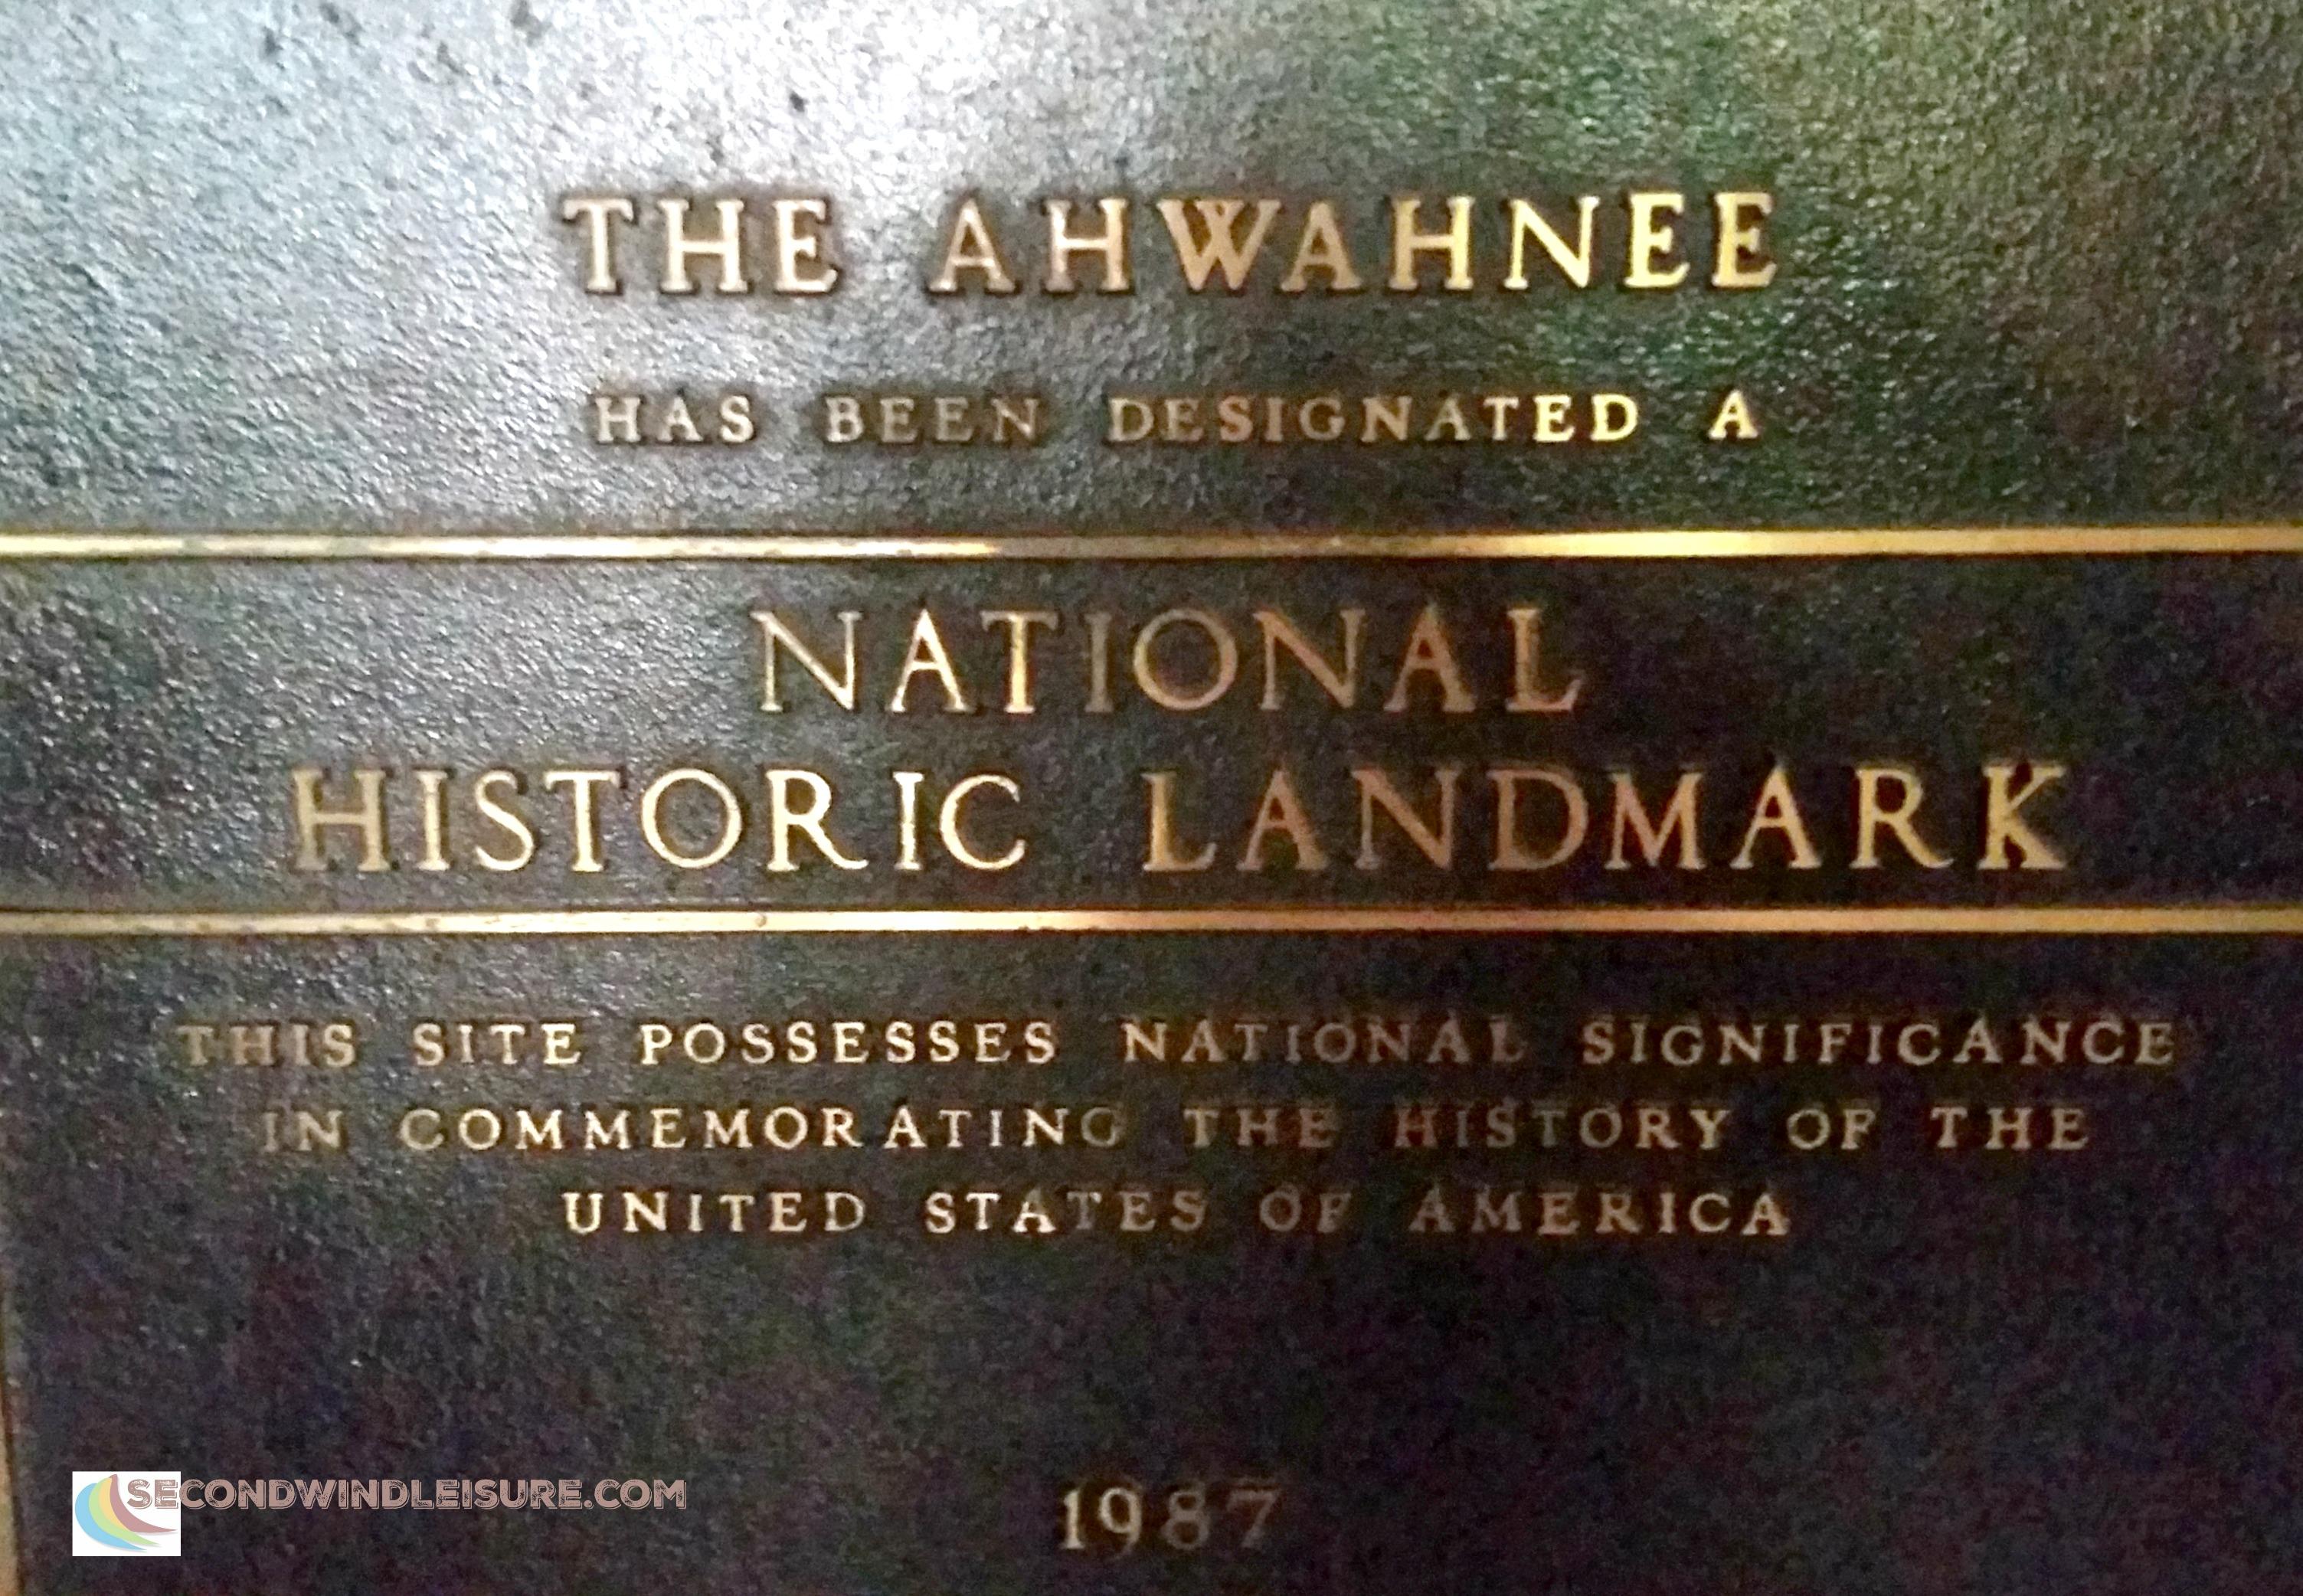 Ahwahnee Hotel national historic landmark